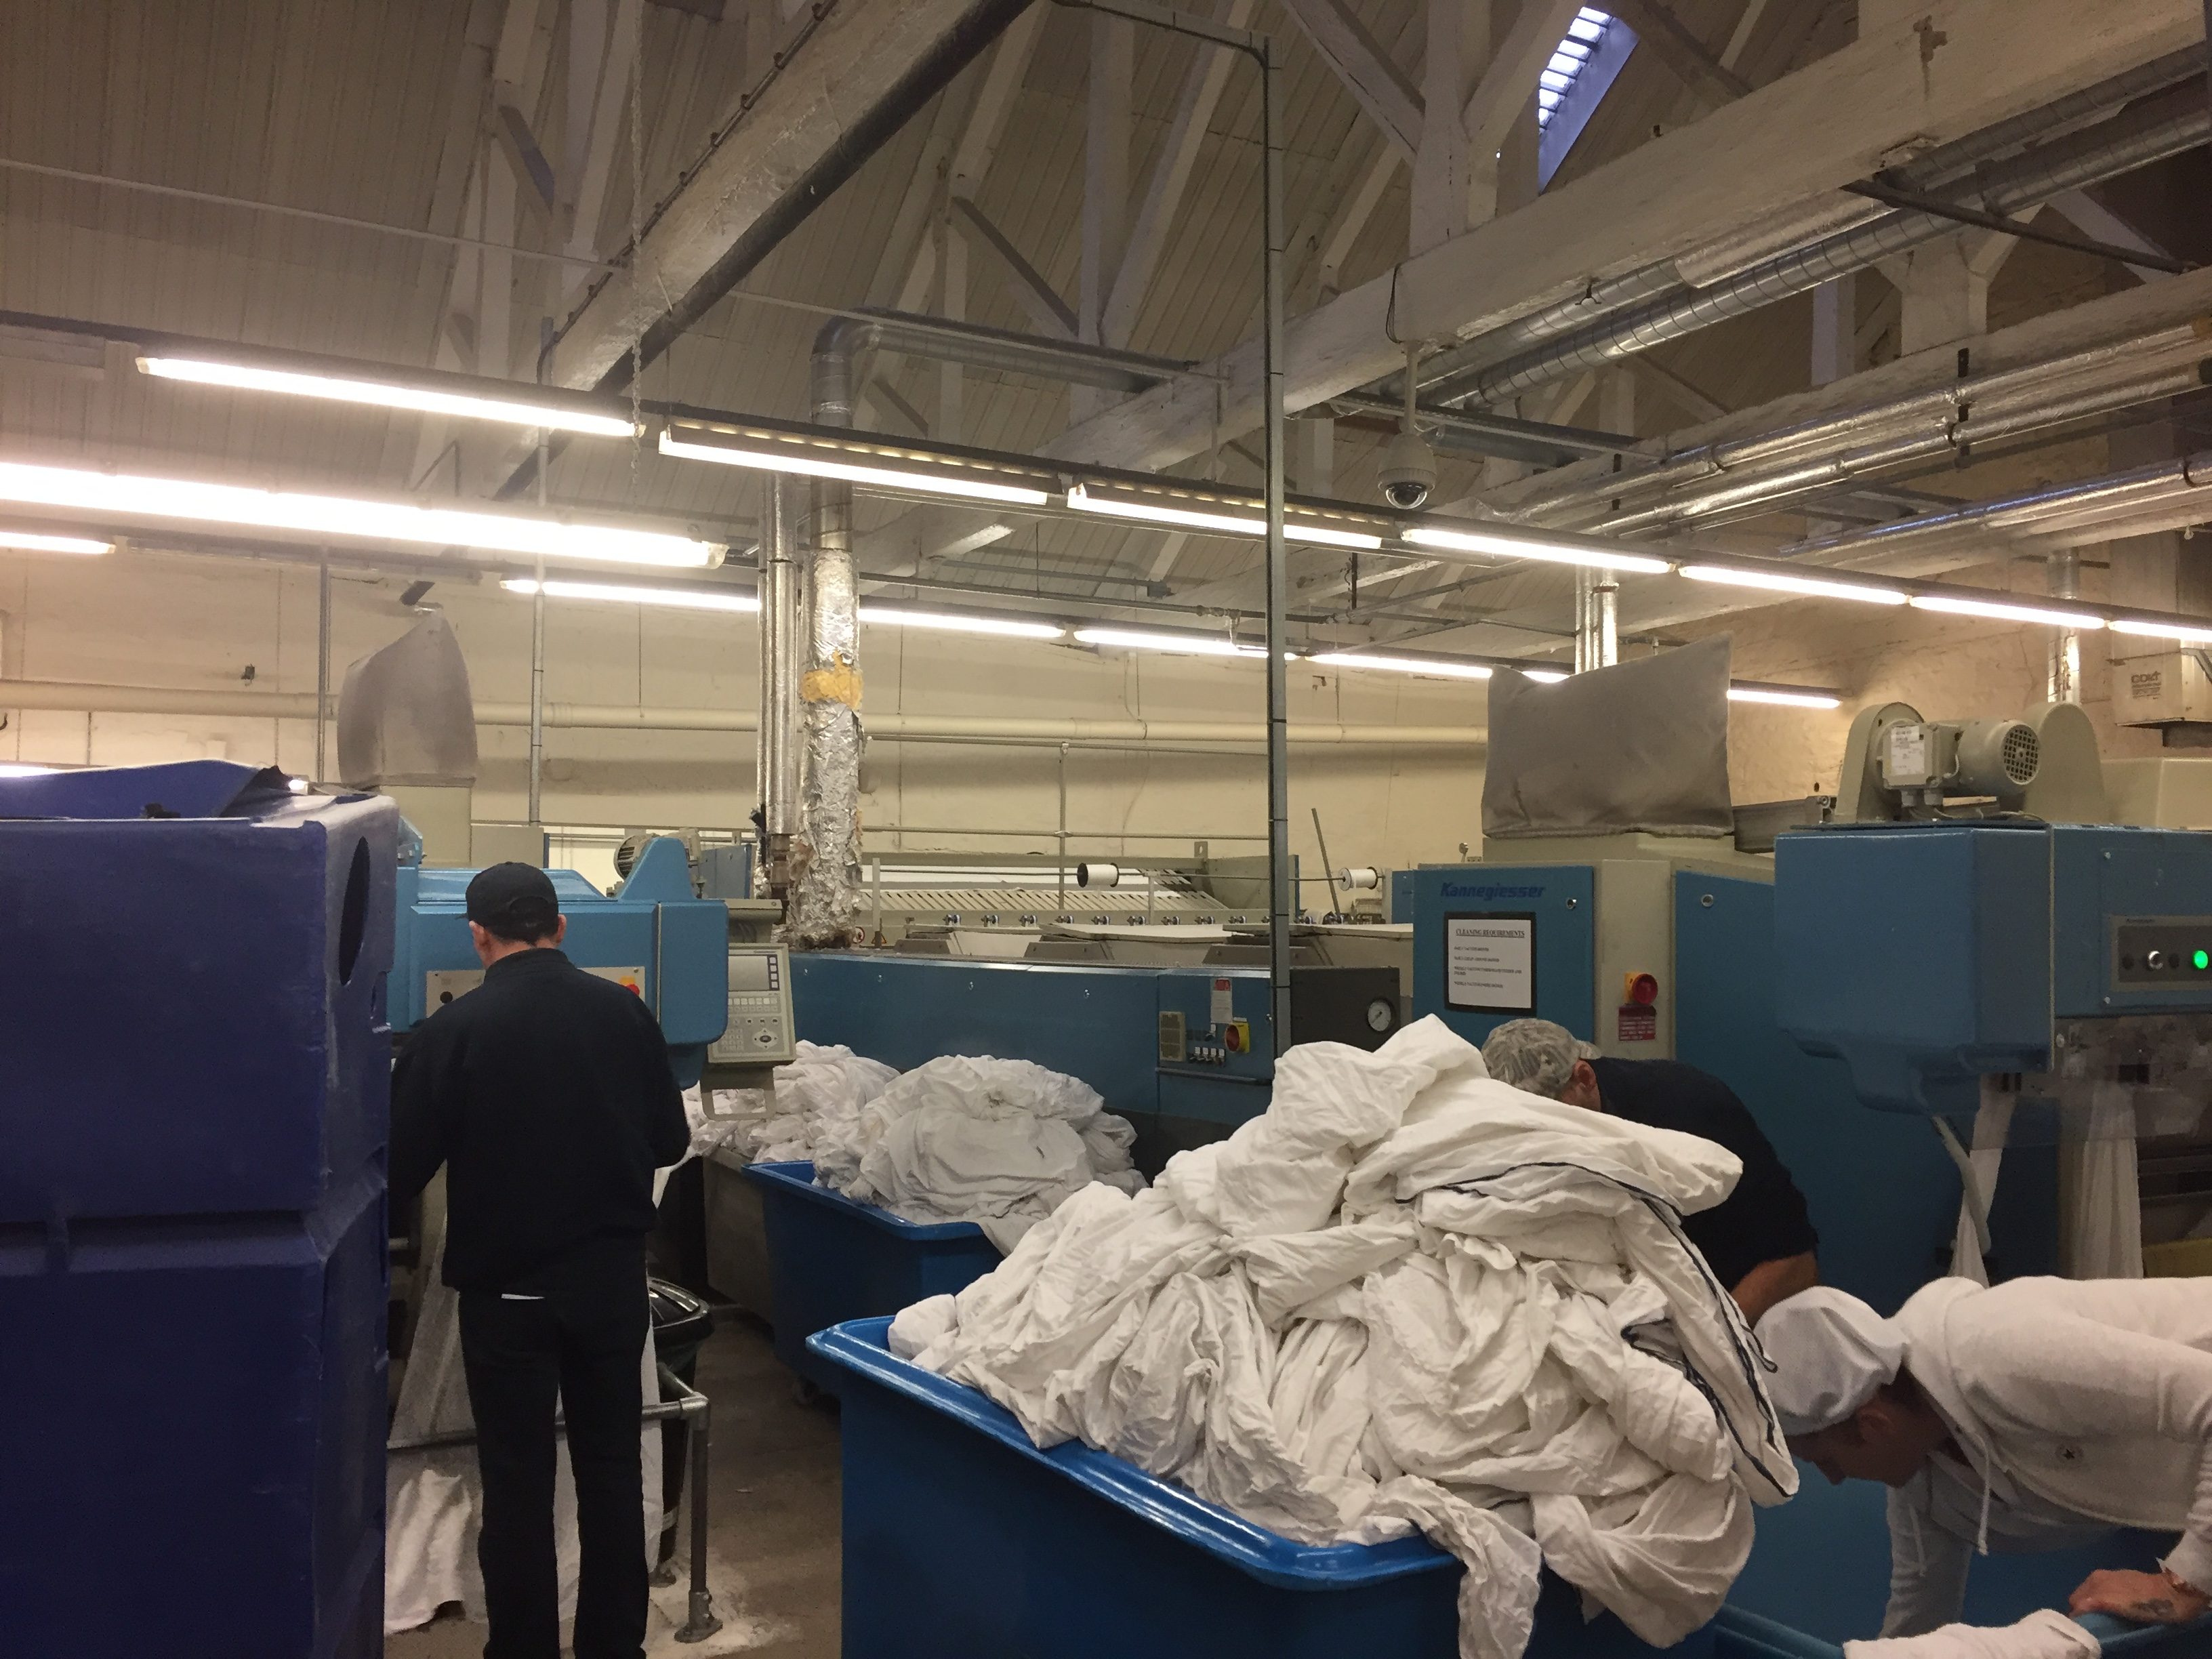 Laundry joins the Hospitality Education